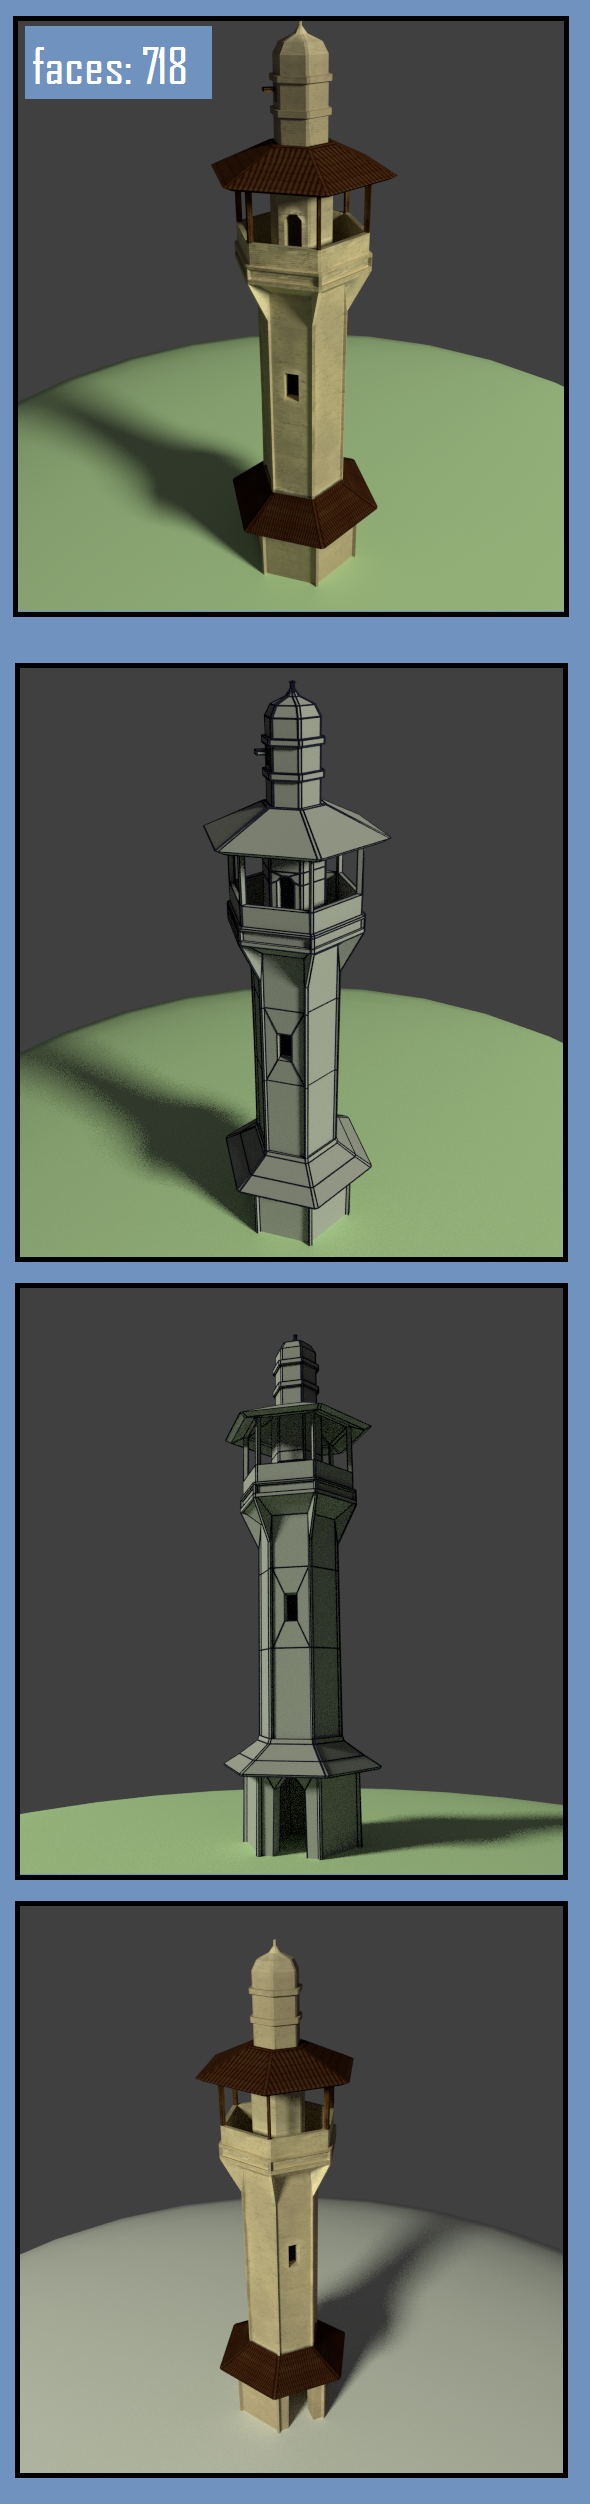 arab moorish minaret low poly building model - 3DOcean Item for Sale